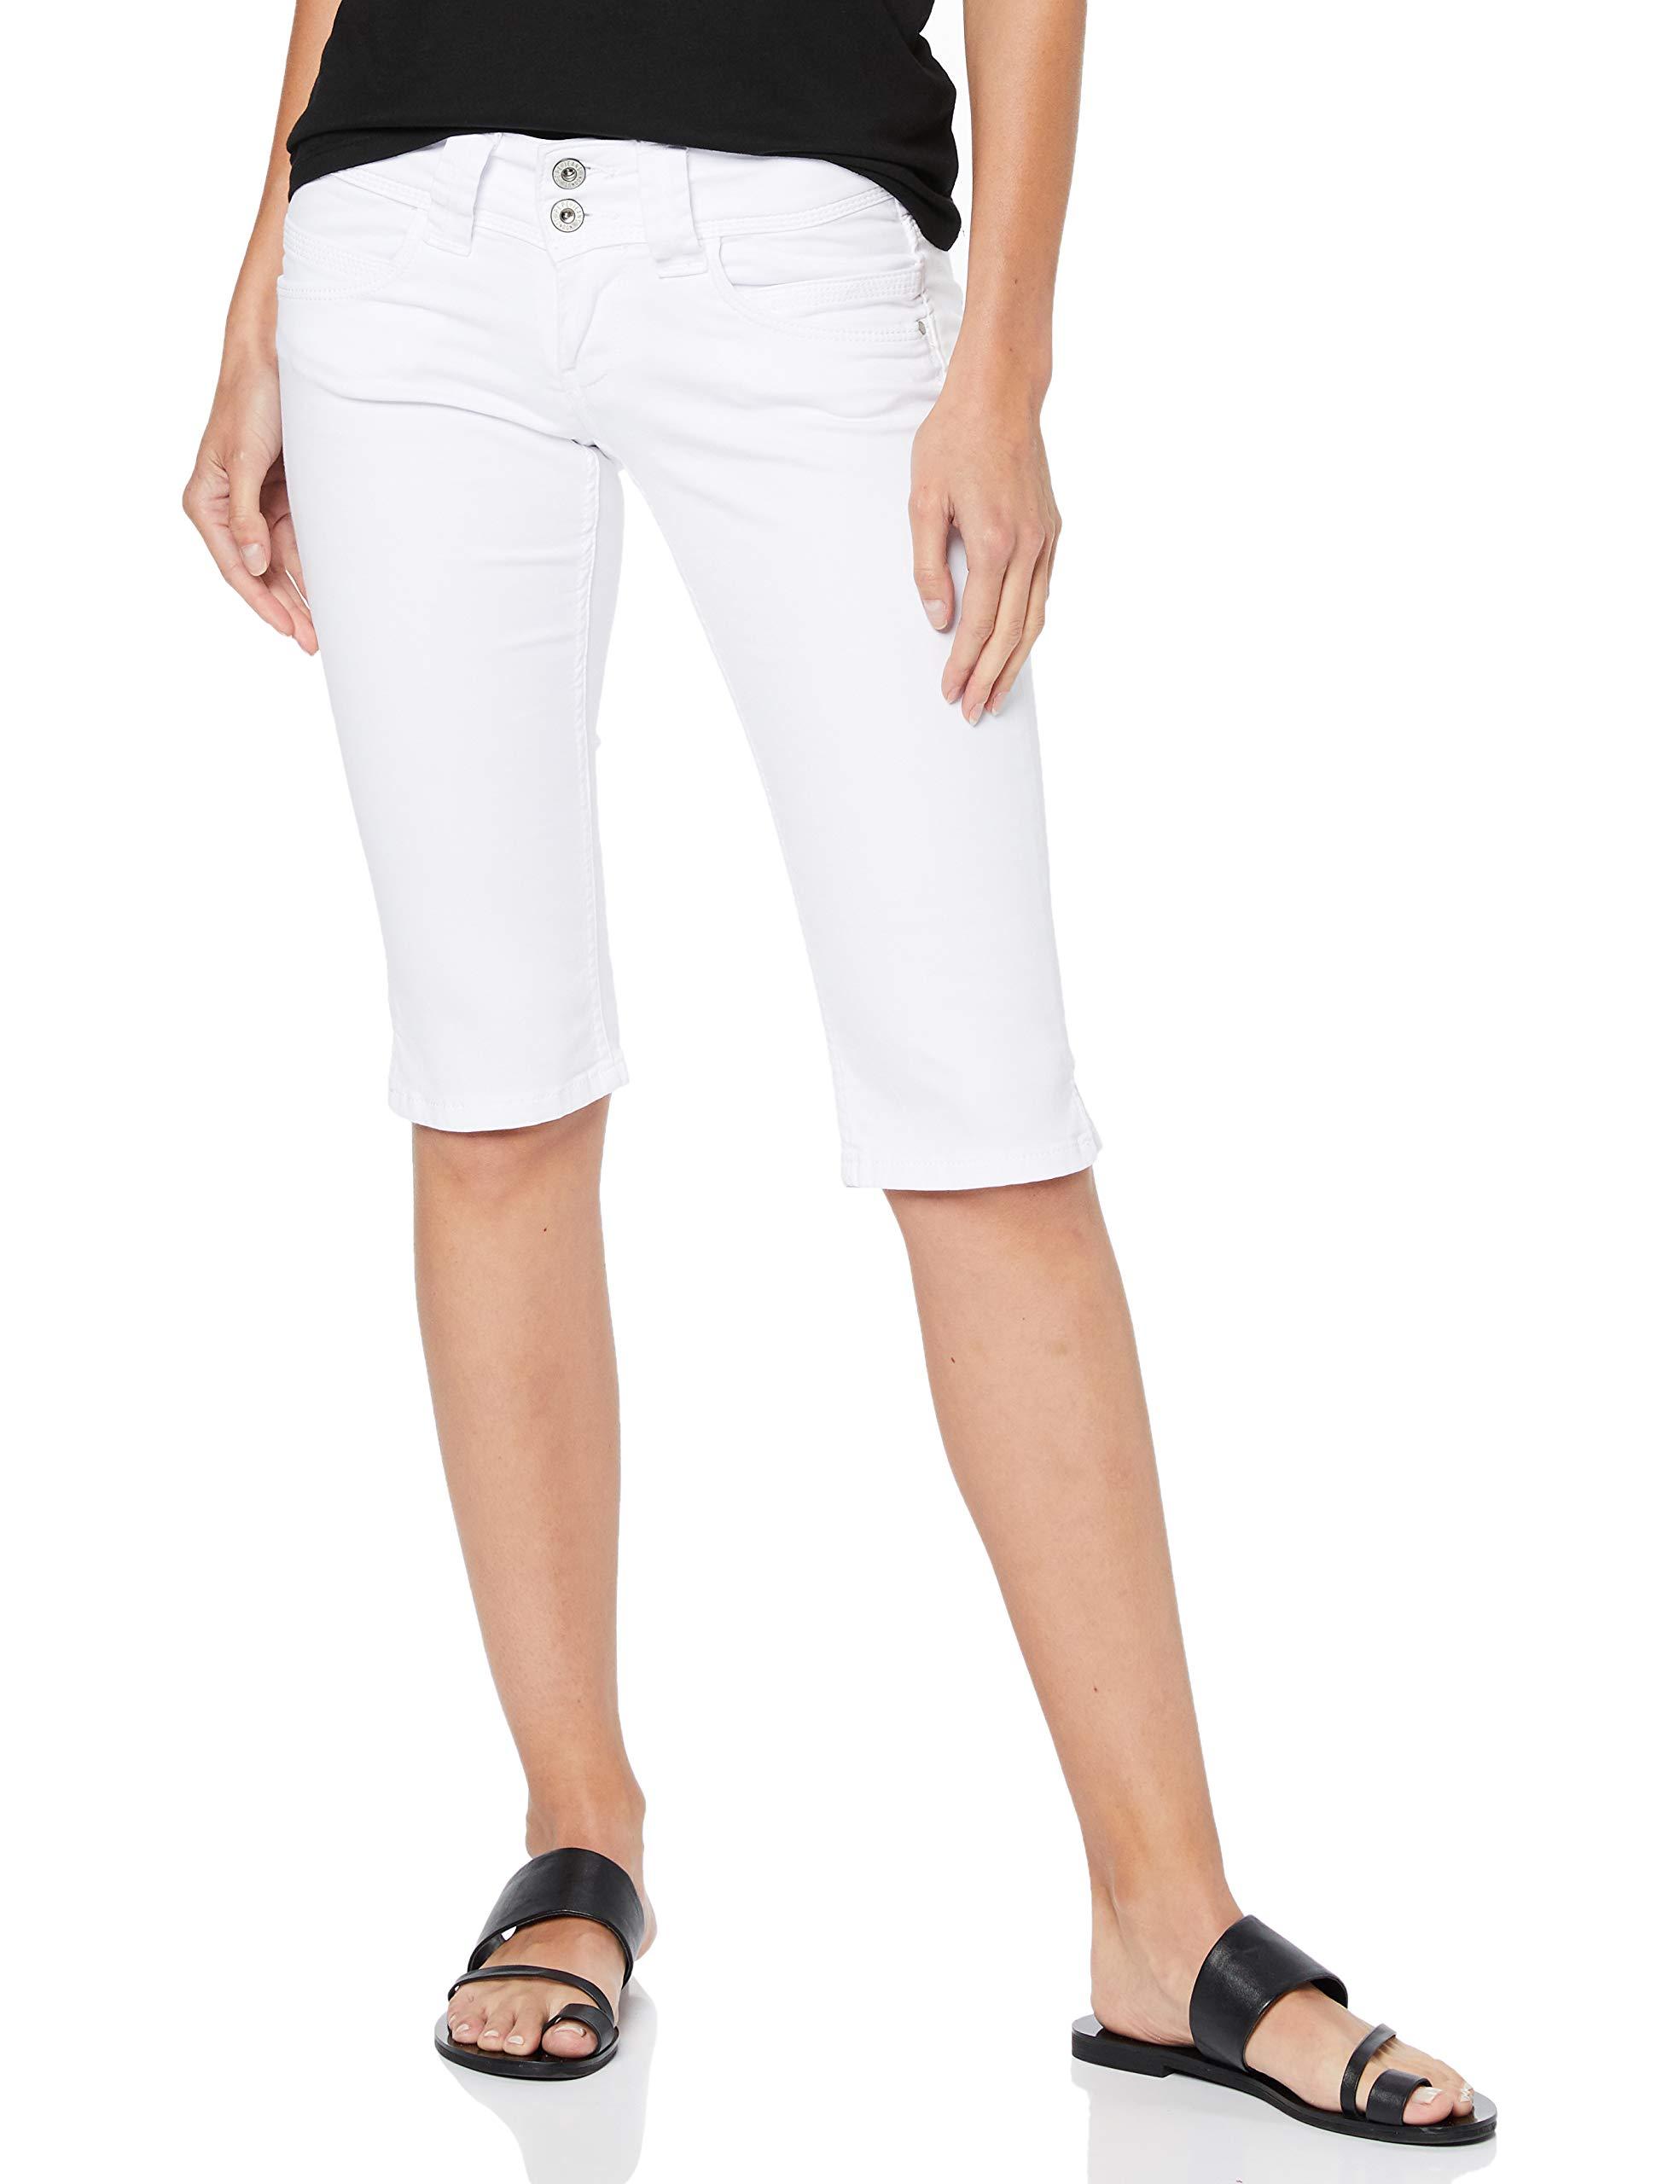 CropShort Optic Venus WhiteFr38taille Jeans FemmeBlancblanc Pepe Fabricant27 nwmN8v0O